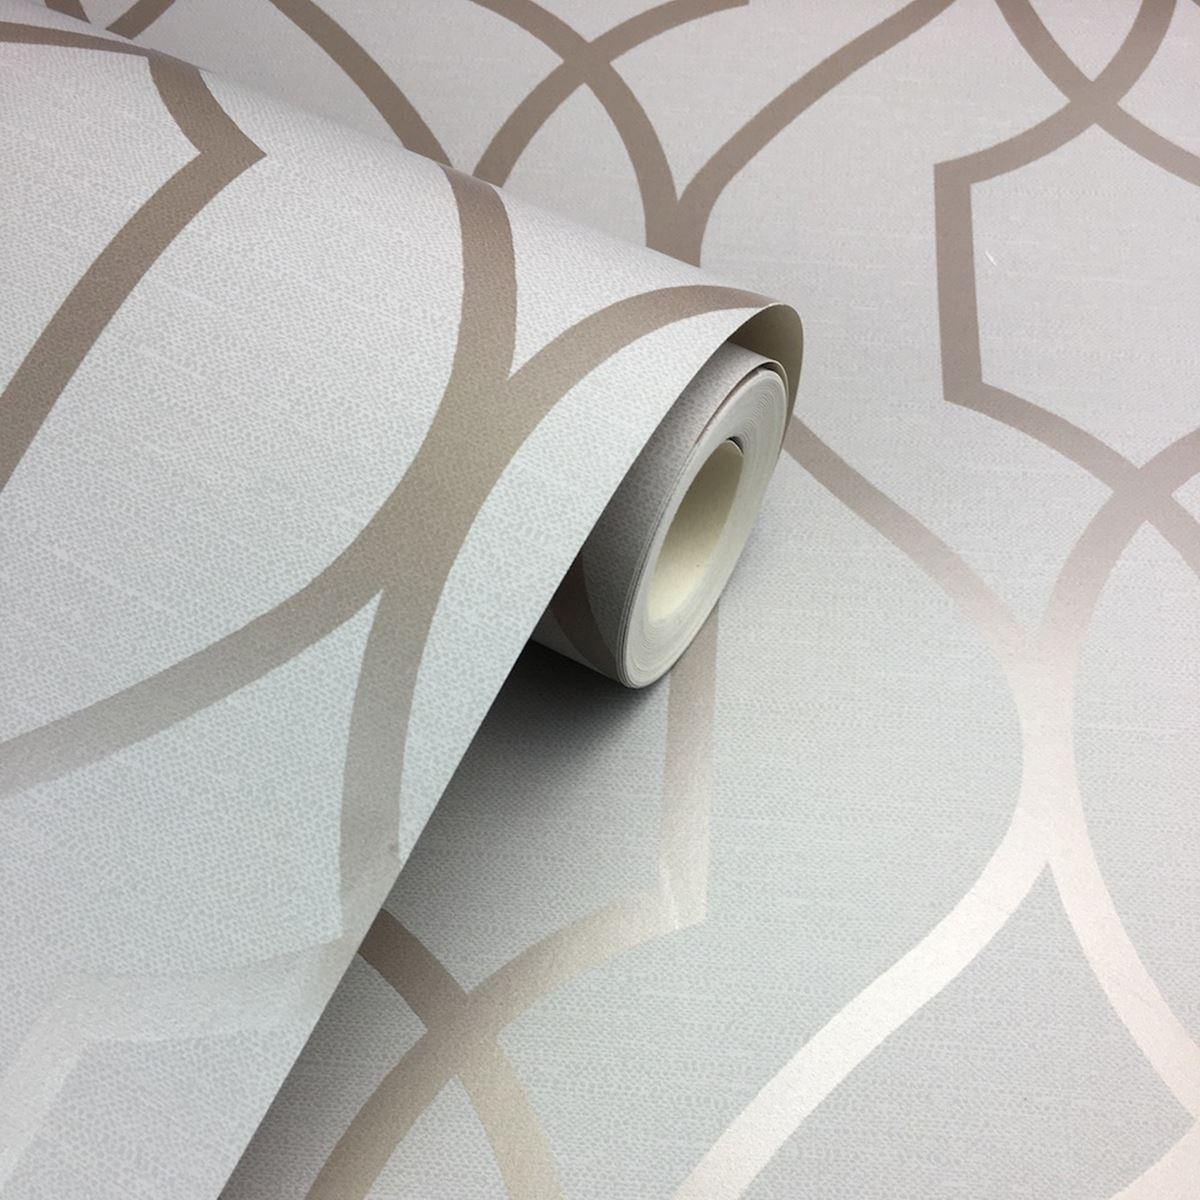 miniatura 150 - Carta da Parati Geometrica Arredamento Camera Moderno Vari Disegni e Colori